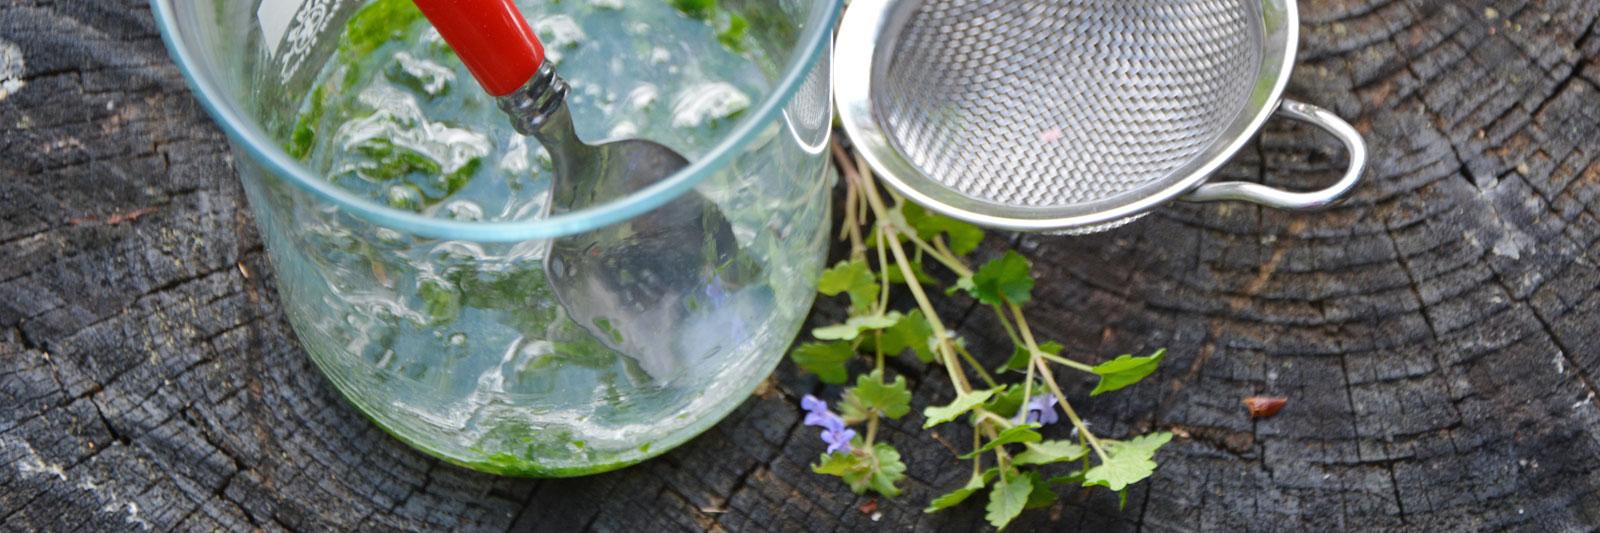 Glas mit Gundelrebe Sieb Kraut Gundelrebe